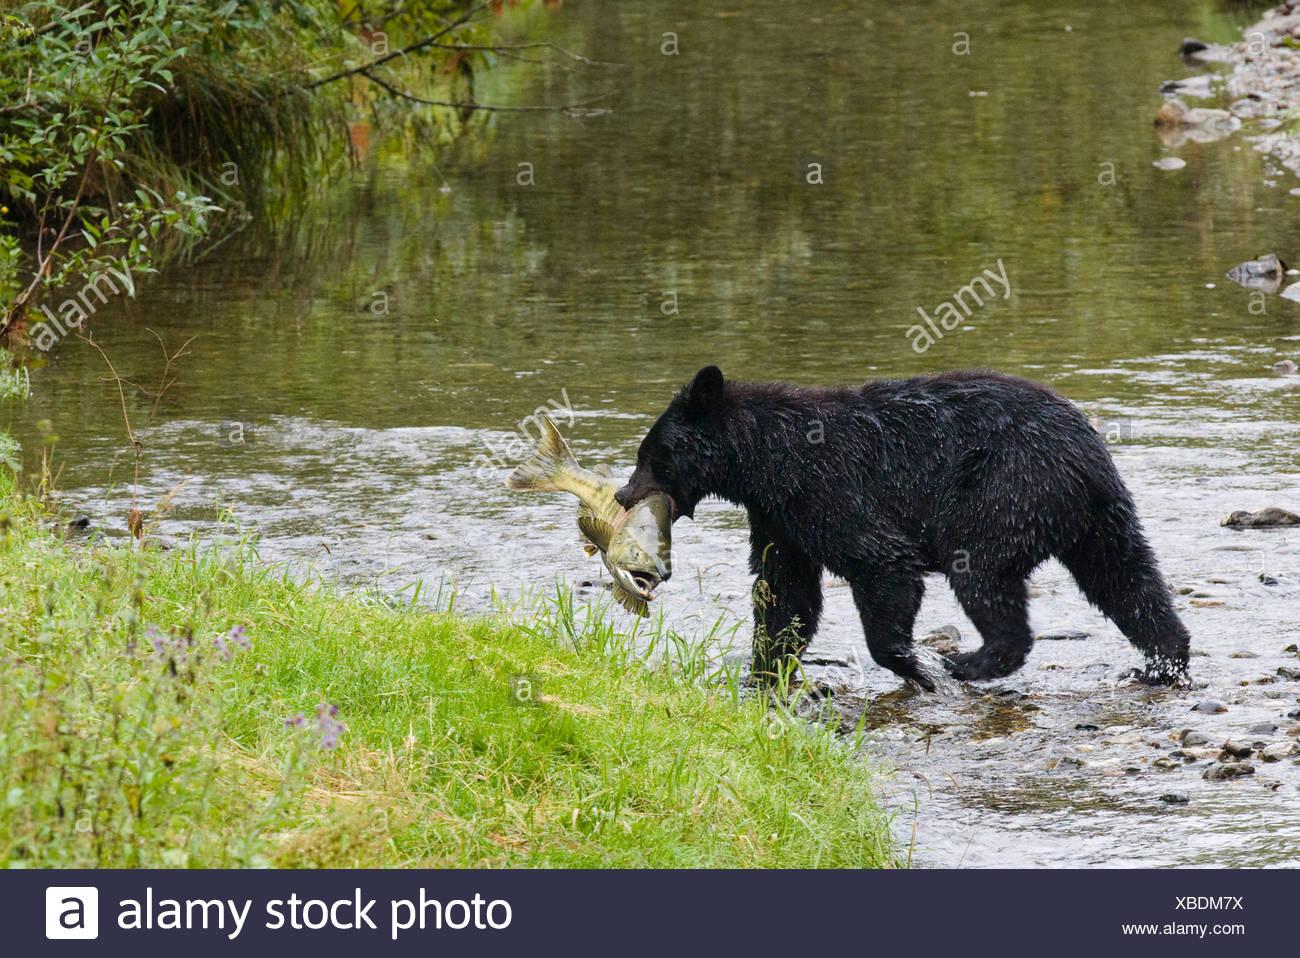 Adultos de oso negro (Ursus americanus) con Chum salmon acaba atrapada, Fish Creek, Tongass National Forest, Alaska, EE.UU. Imagen De Stock